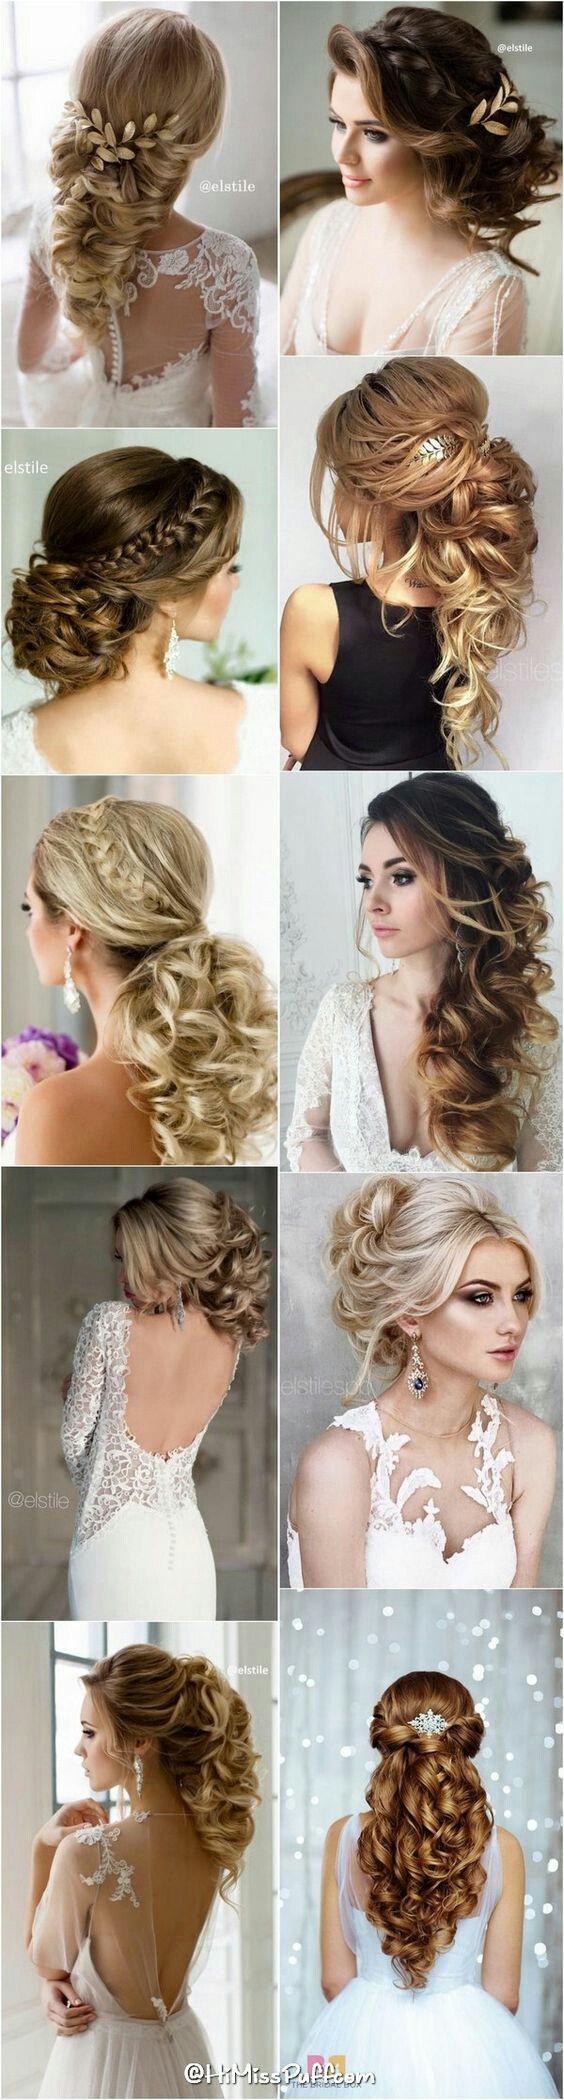 Fairytale Princess Chic Wedding Hairstyles Hair Styles Long Hair Styles Hair Beauty